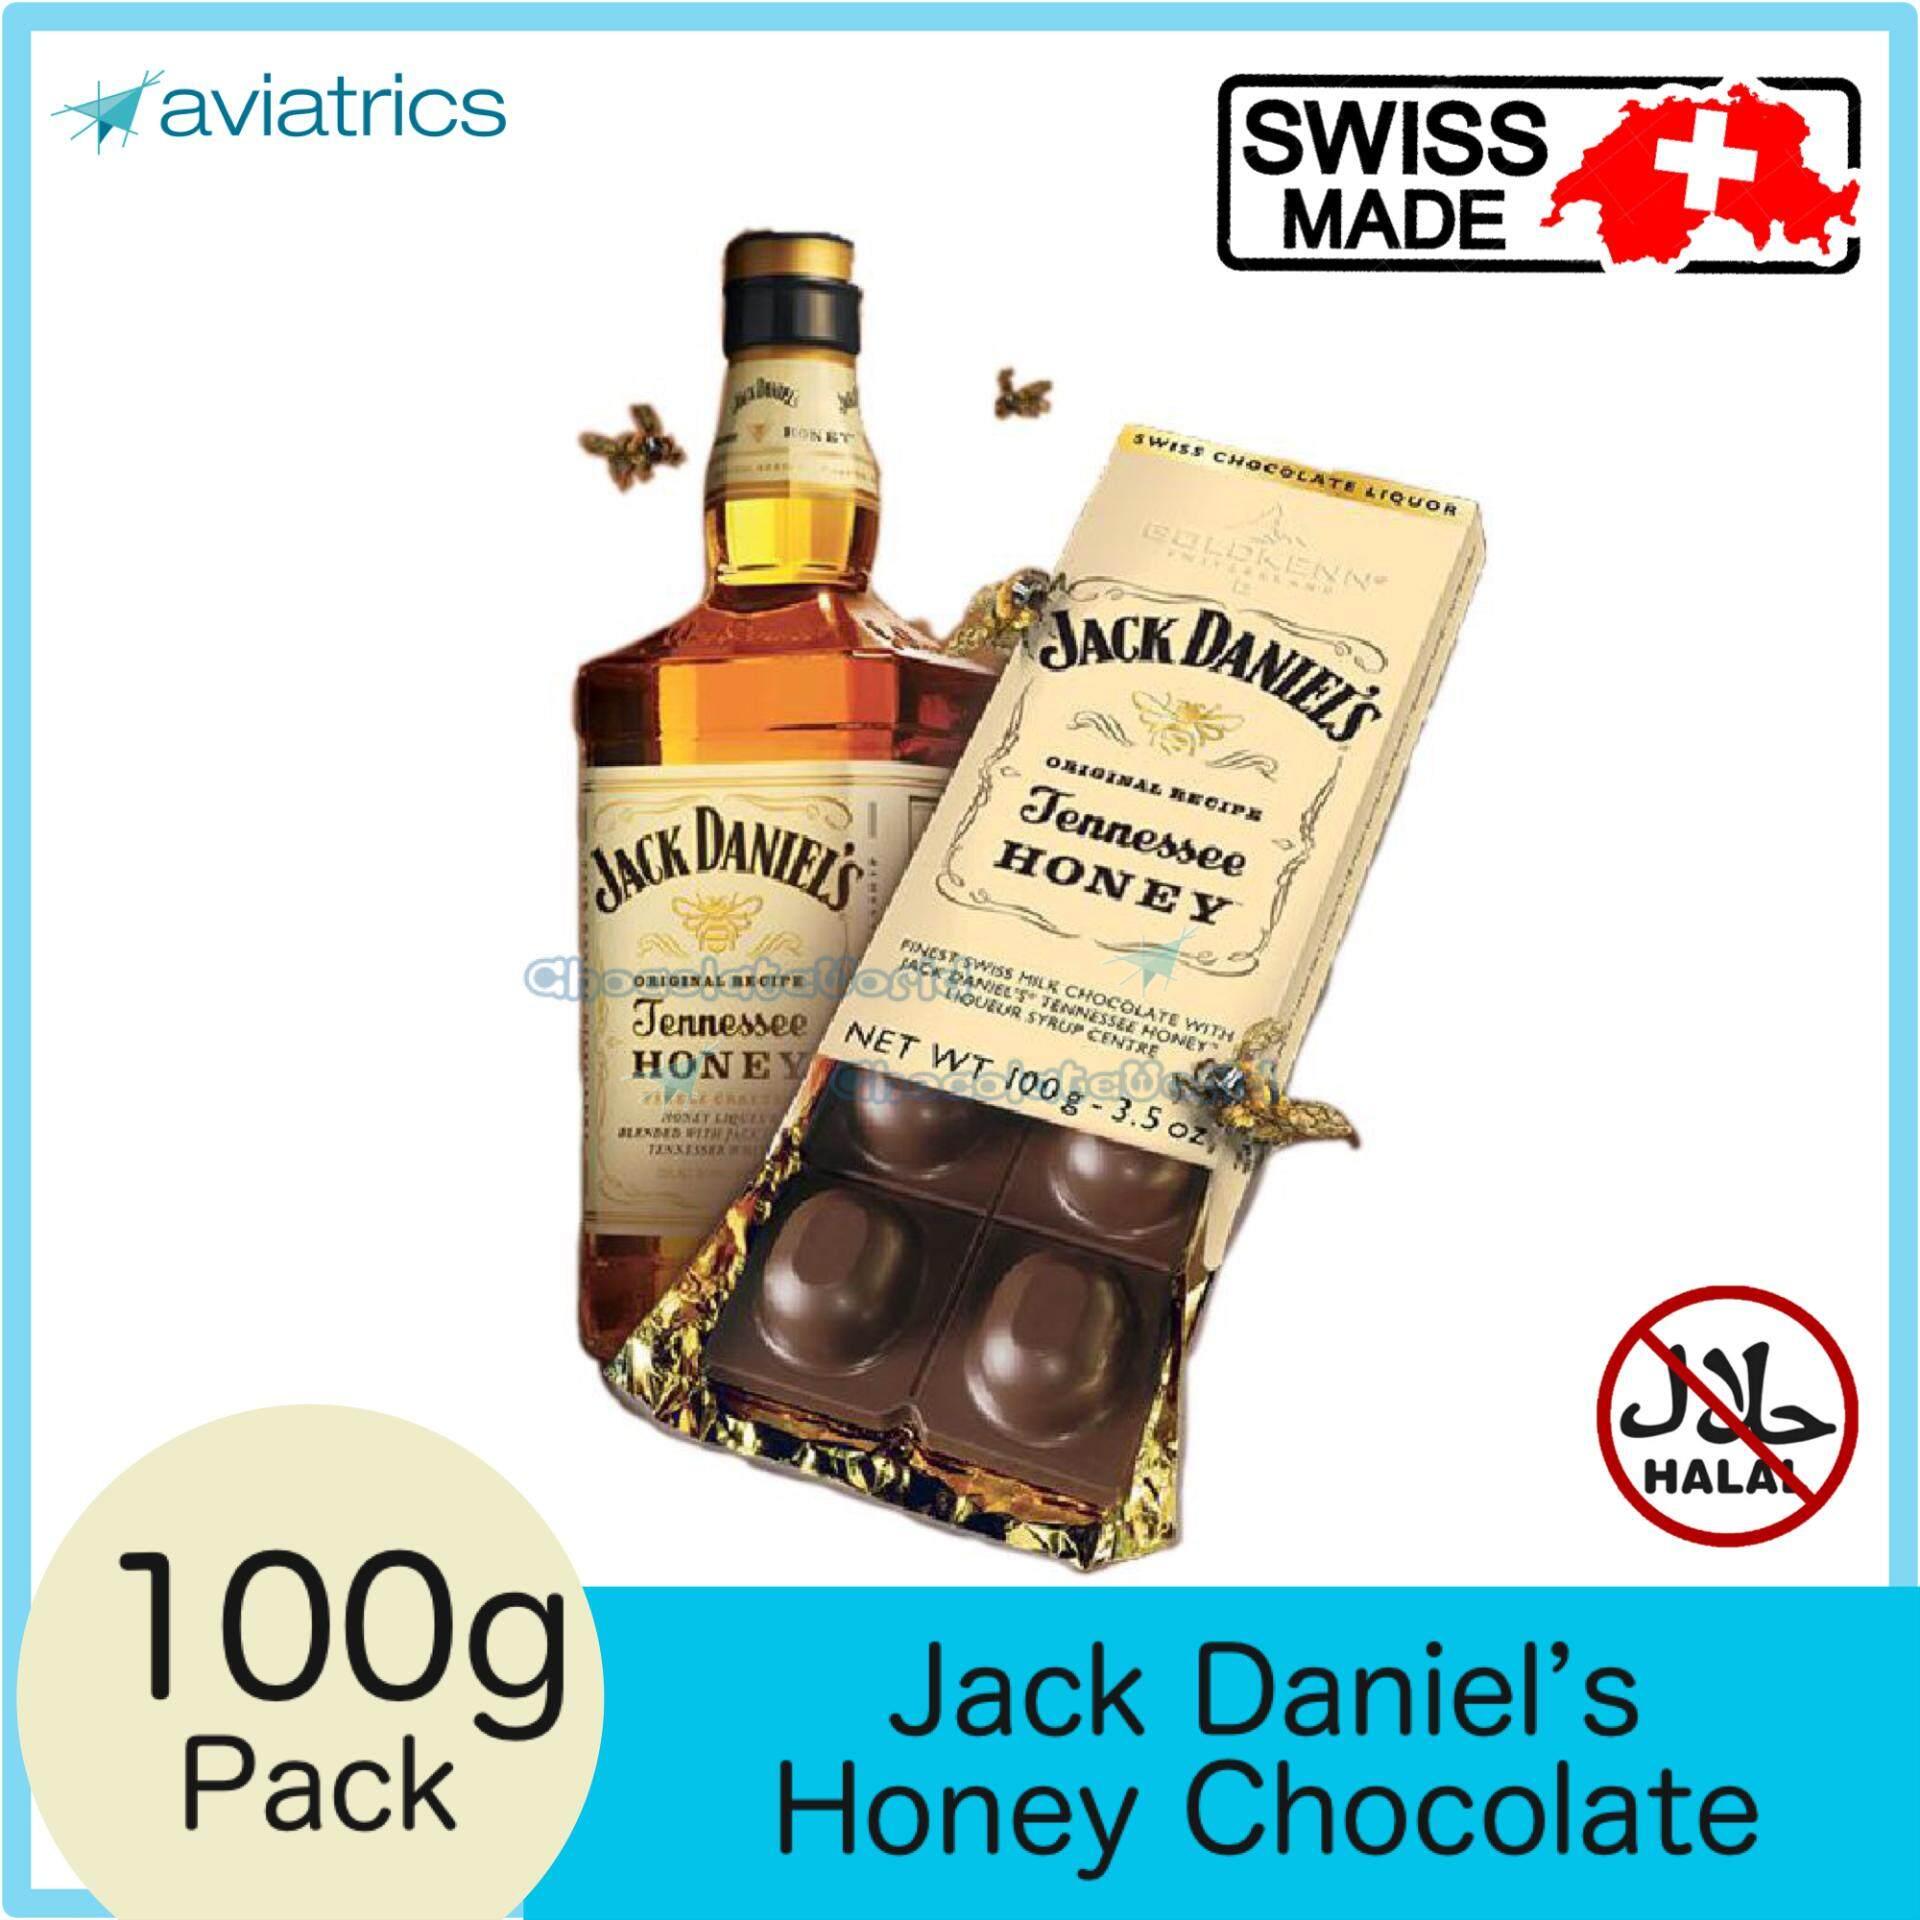 Goldkenn Jack Daniel's Tennessee Honey Swiss Milk Chocolate 100g (Swiss Made)